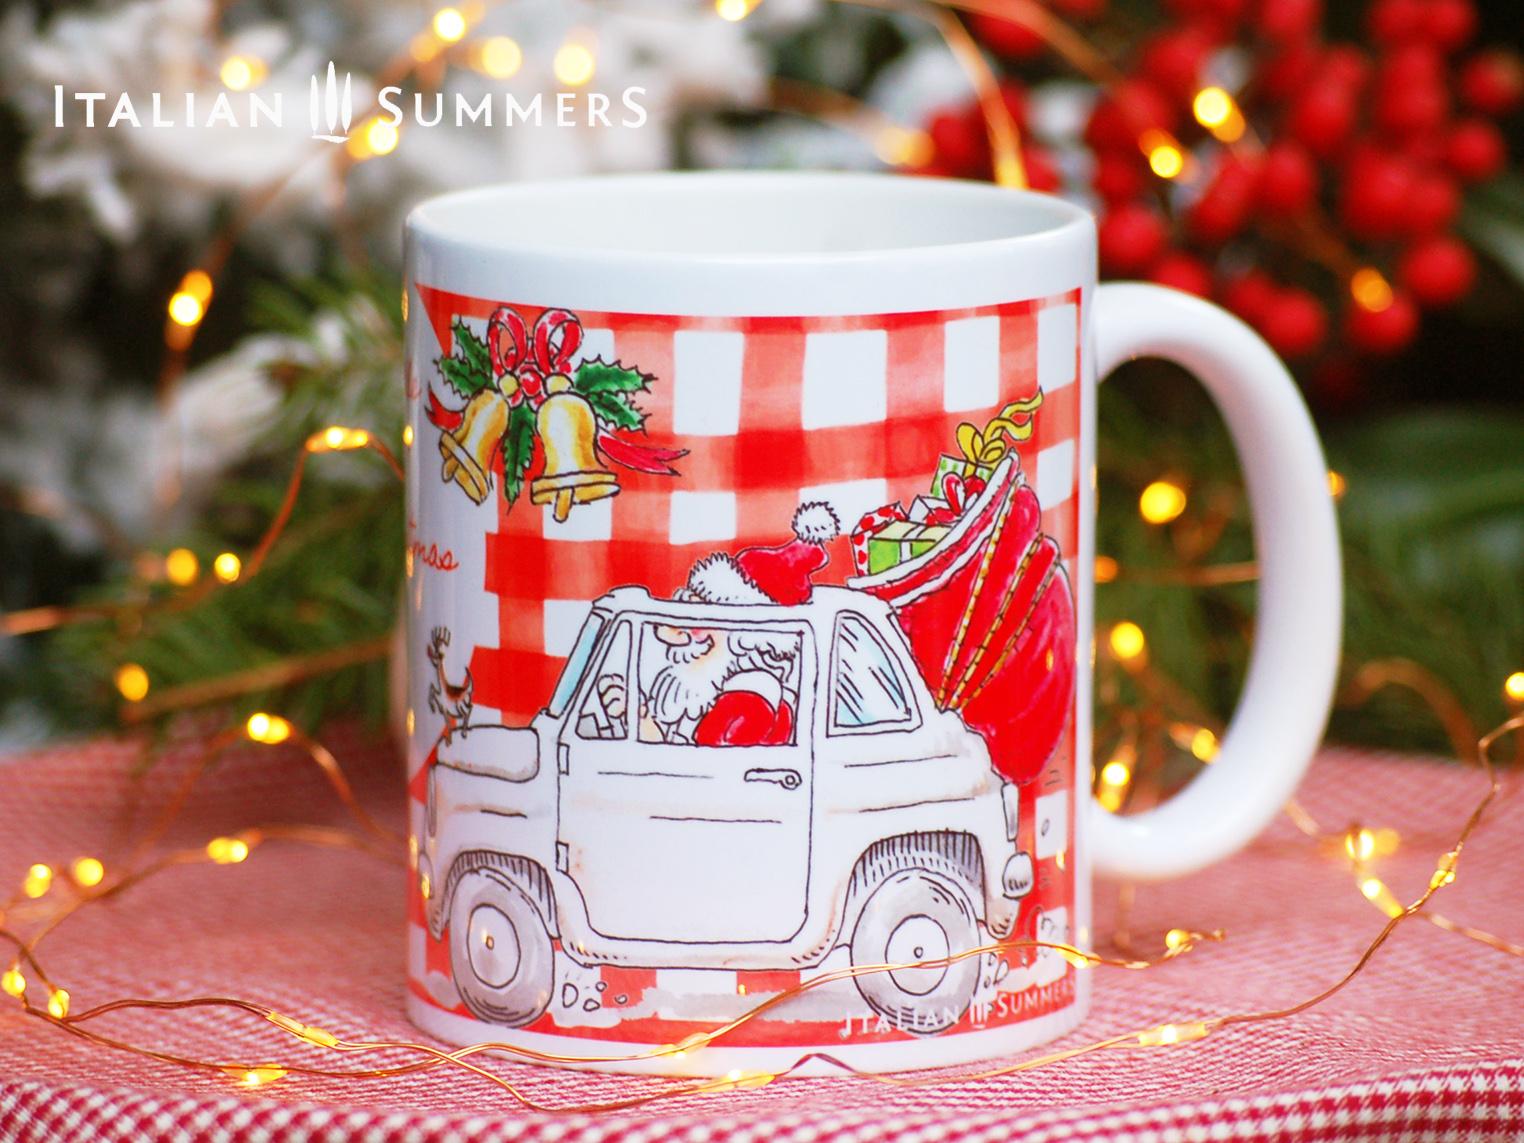 Italian Christmas mug ITALIAN SANTA trattoria style by Italian Summers